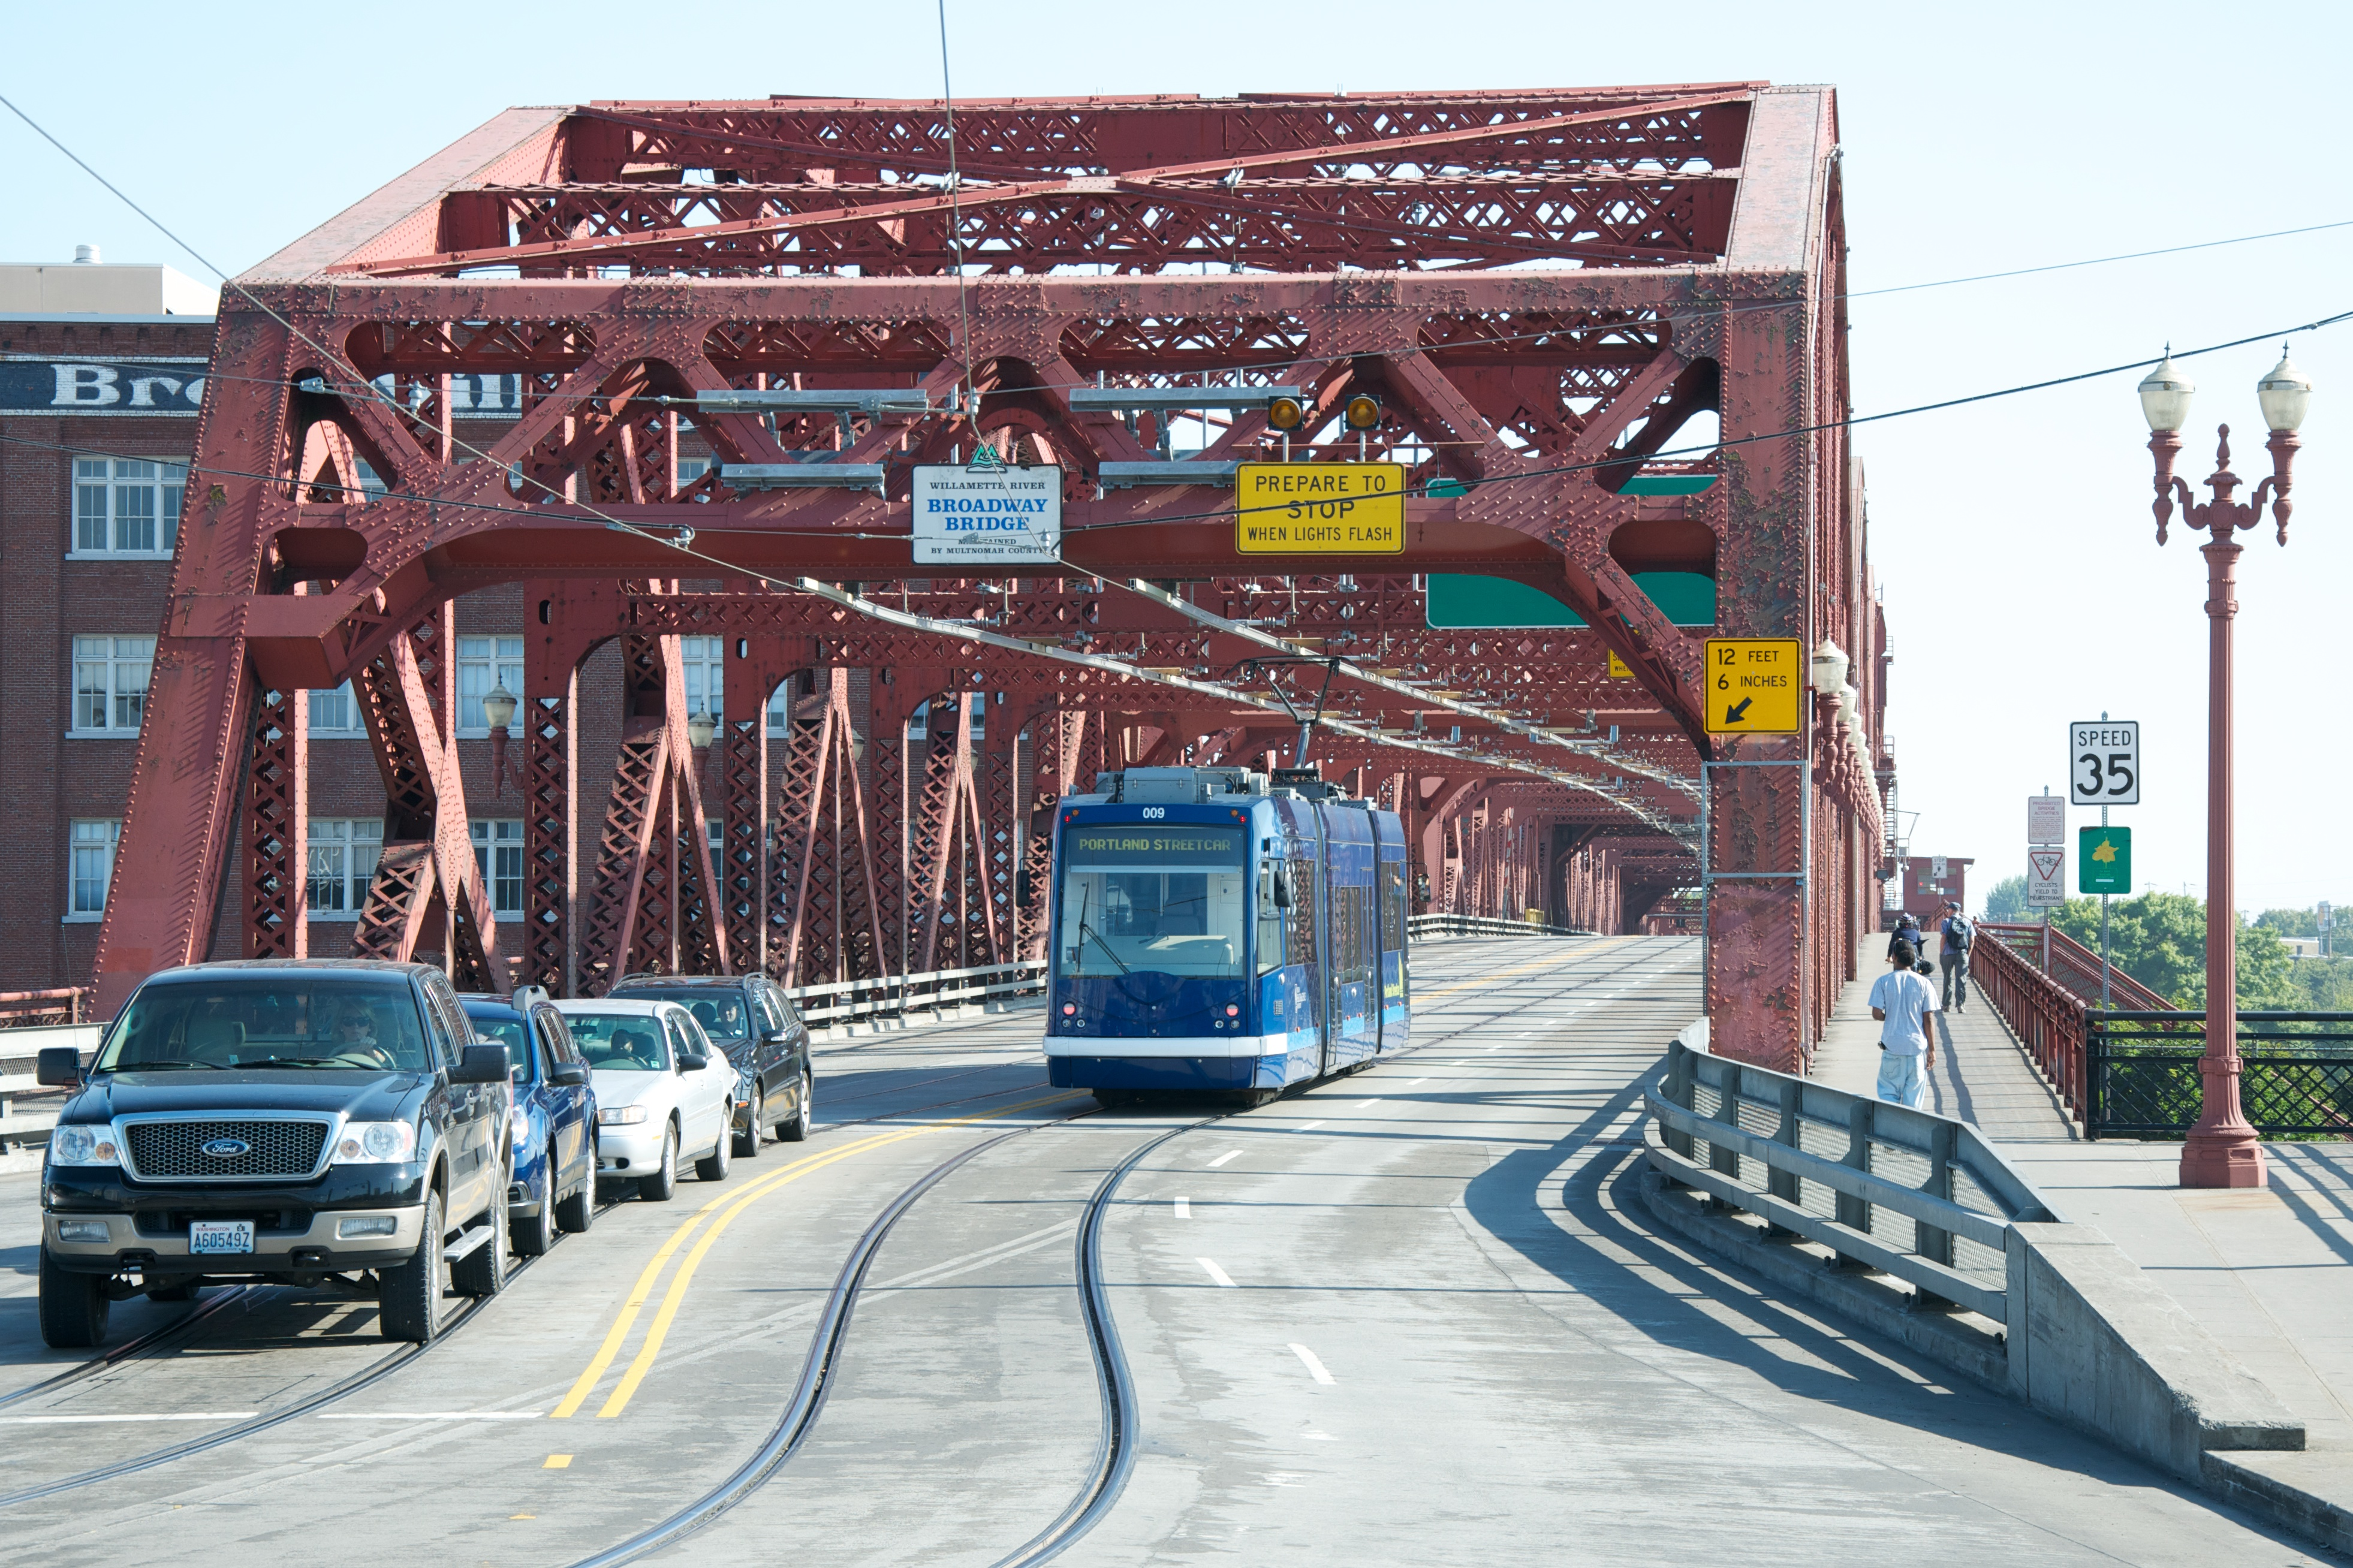 New Portland Streetcar Crossing The Broadway Bridge Flickr Photo Sharing